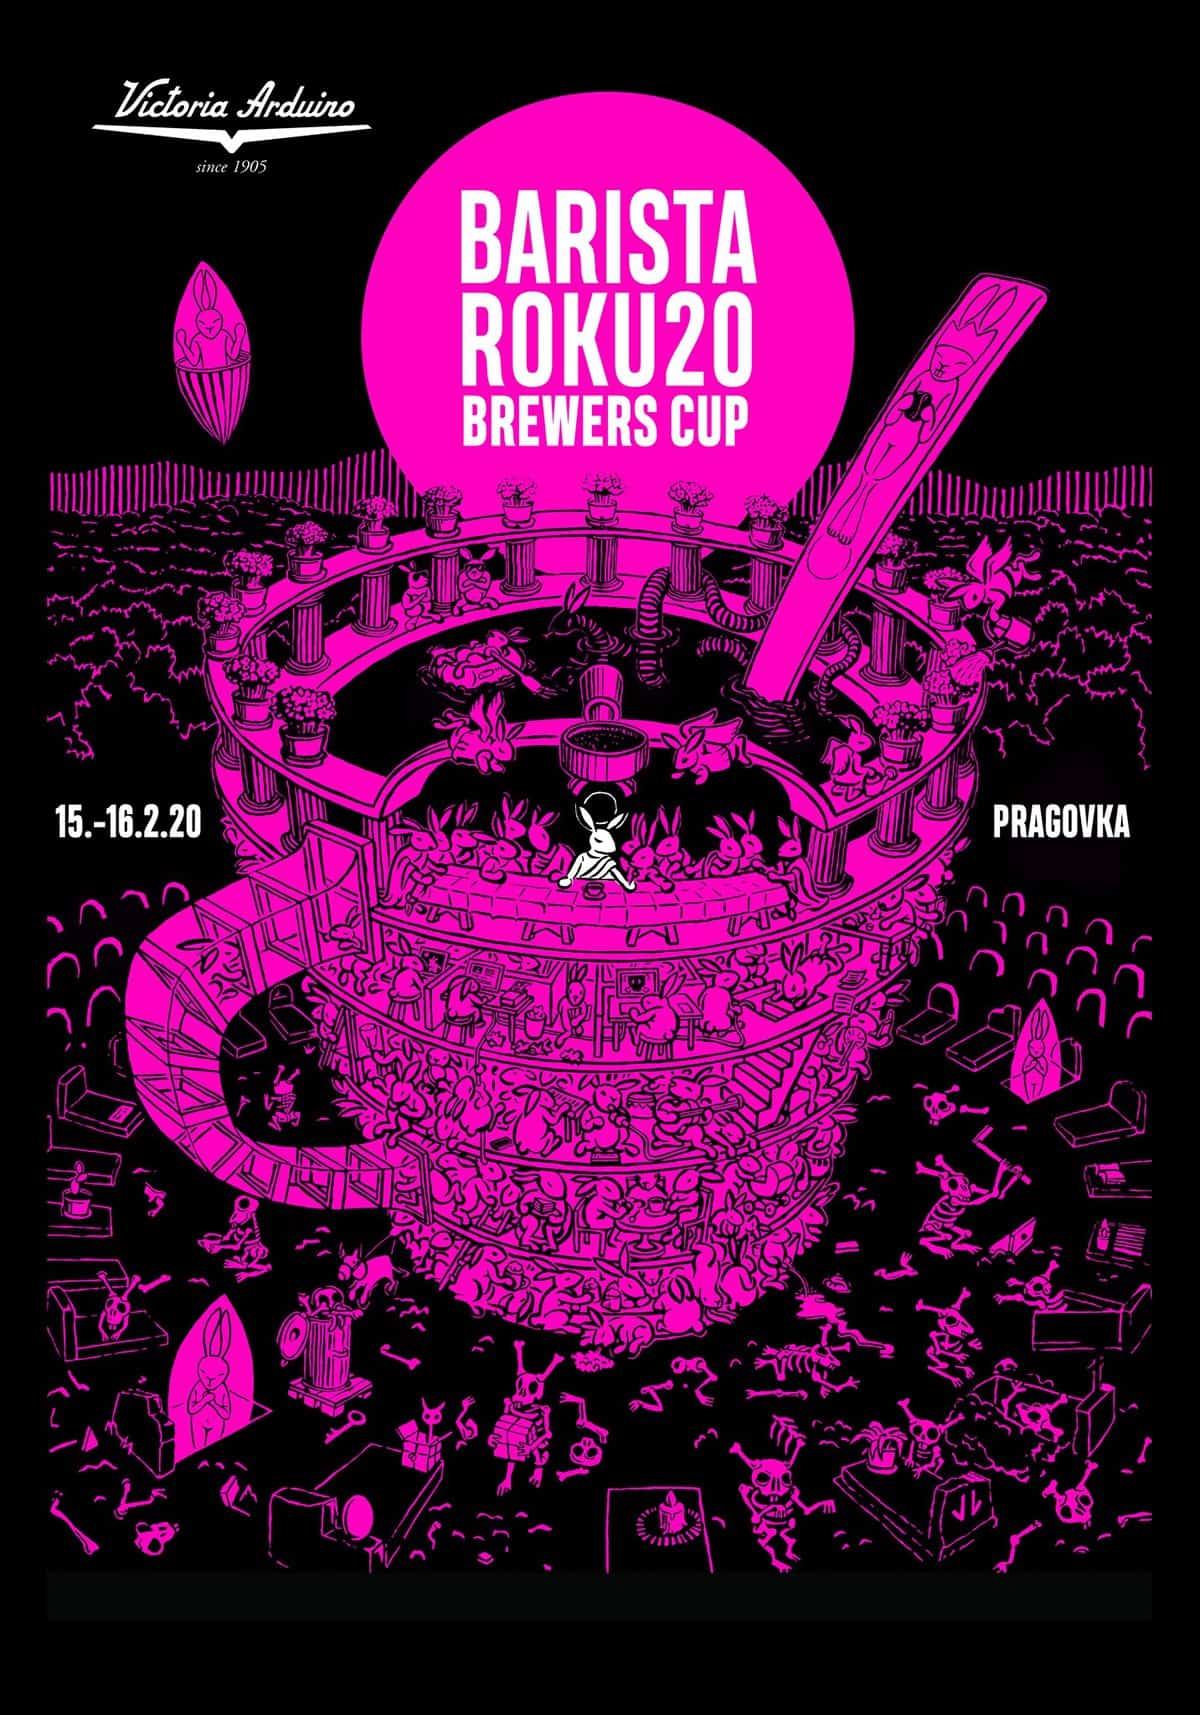 Barista Roku 2020 - Czech Coffee Championships 2020